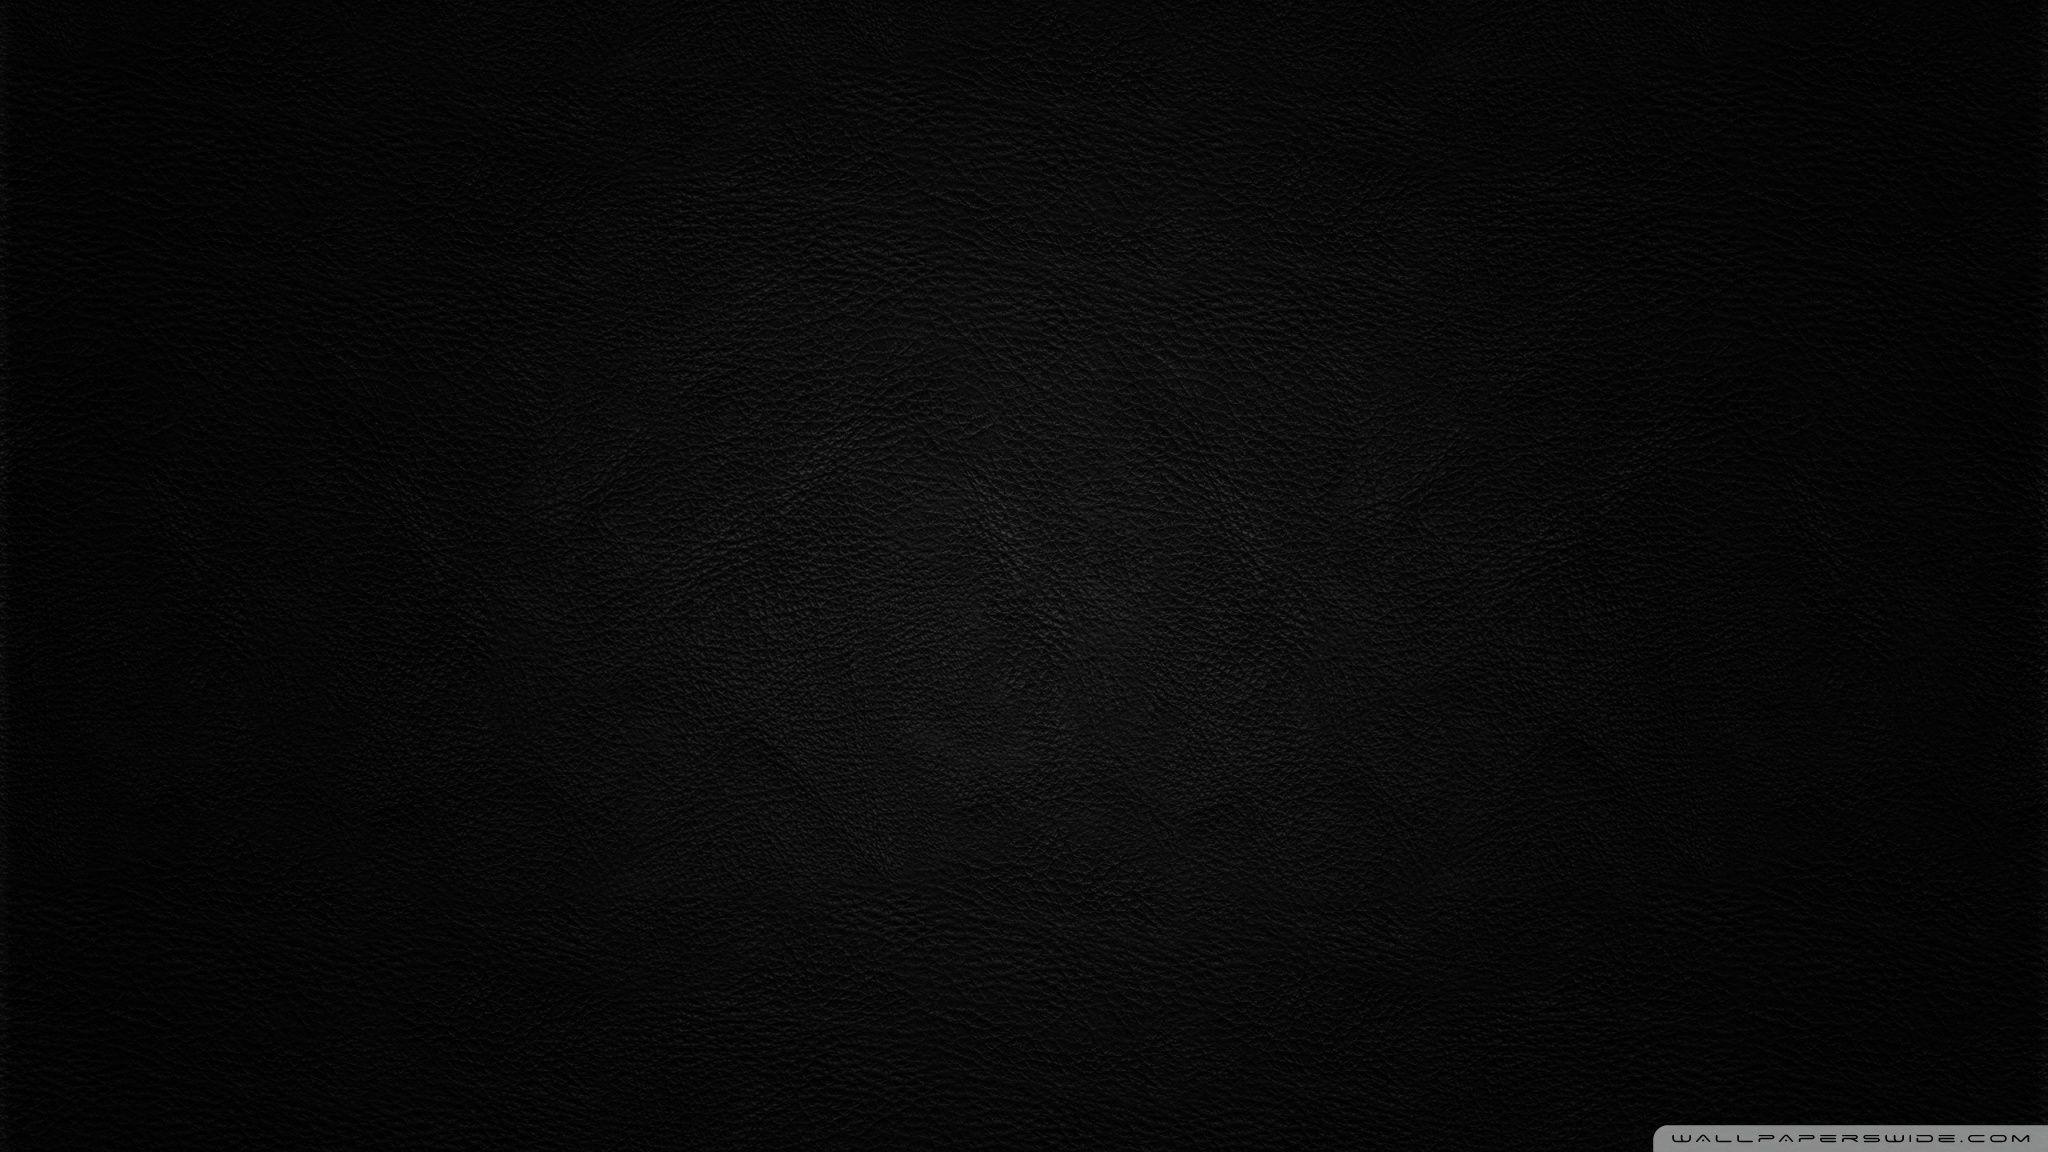 20X20 Black Wallpapers on WallpaperDog